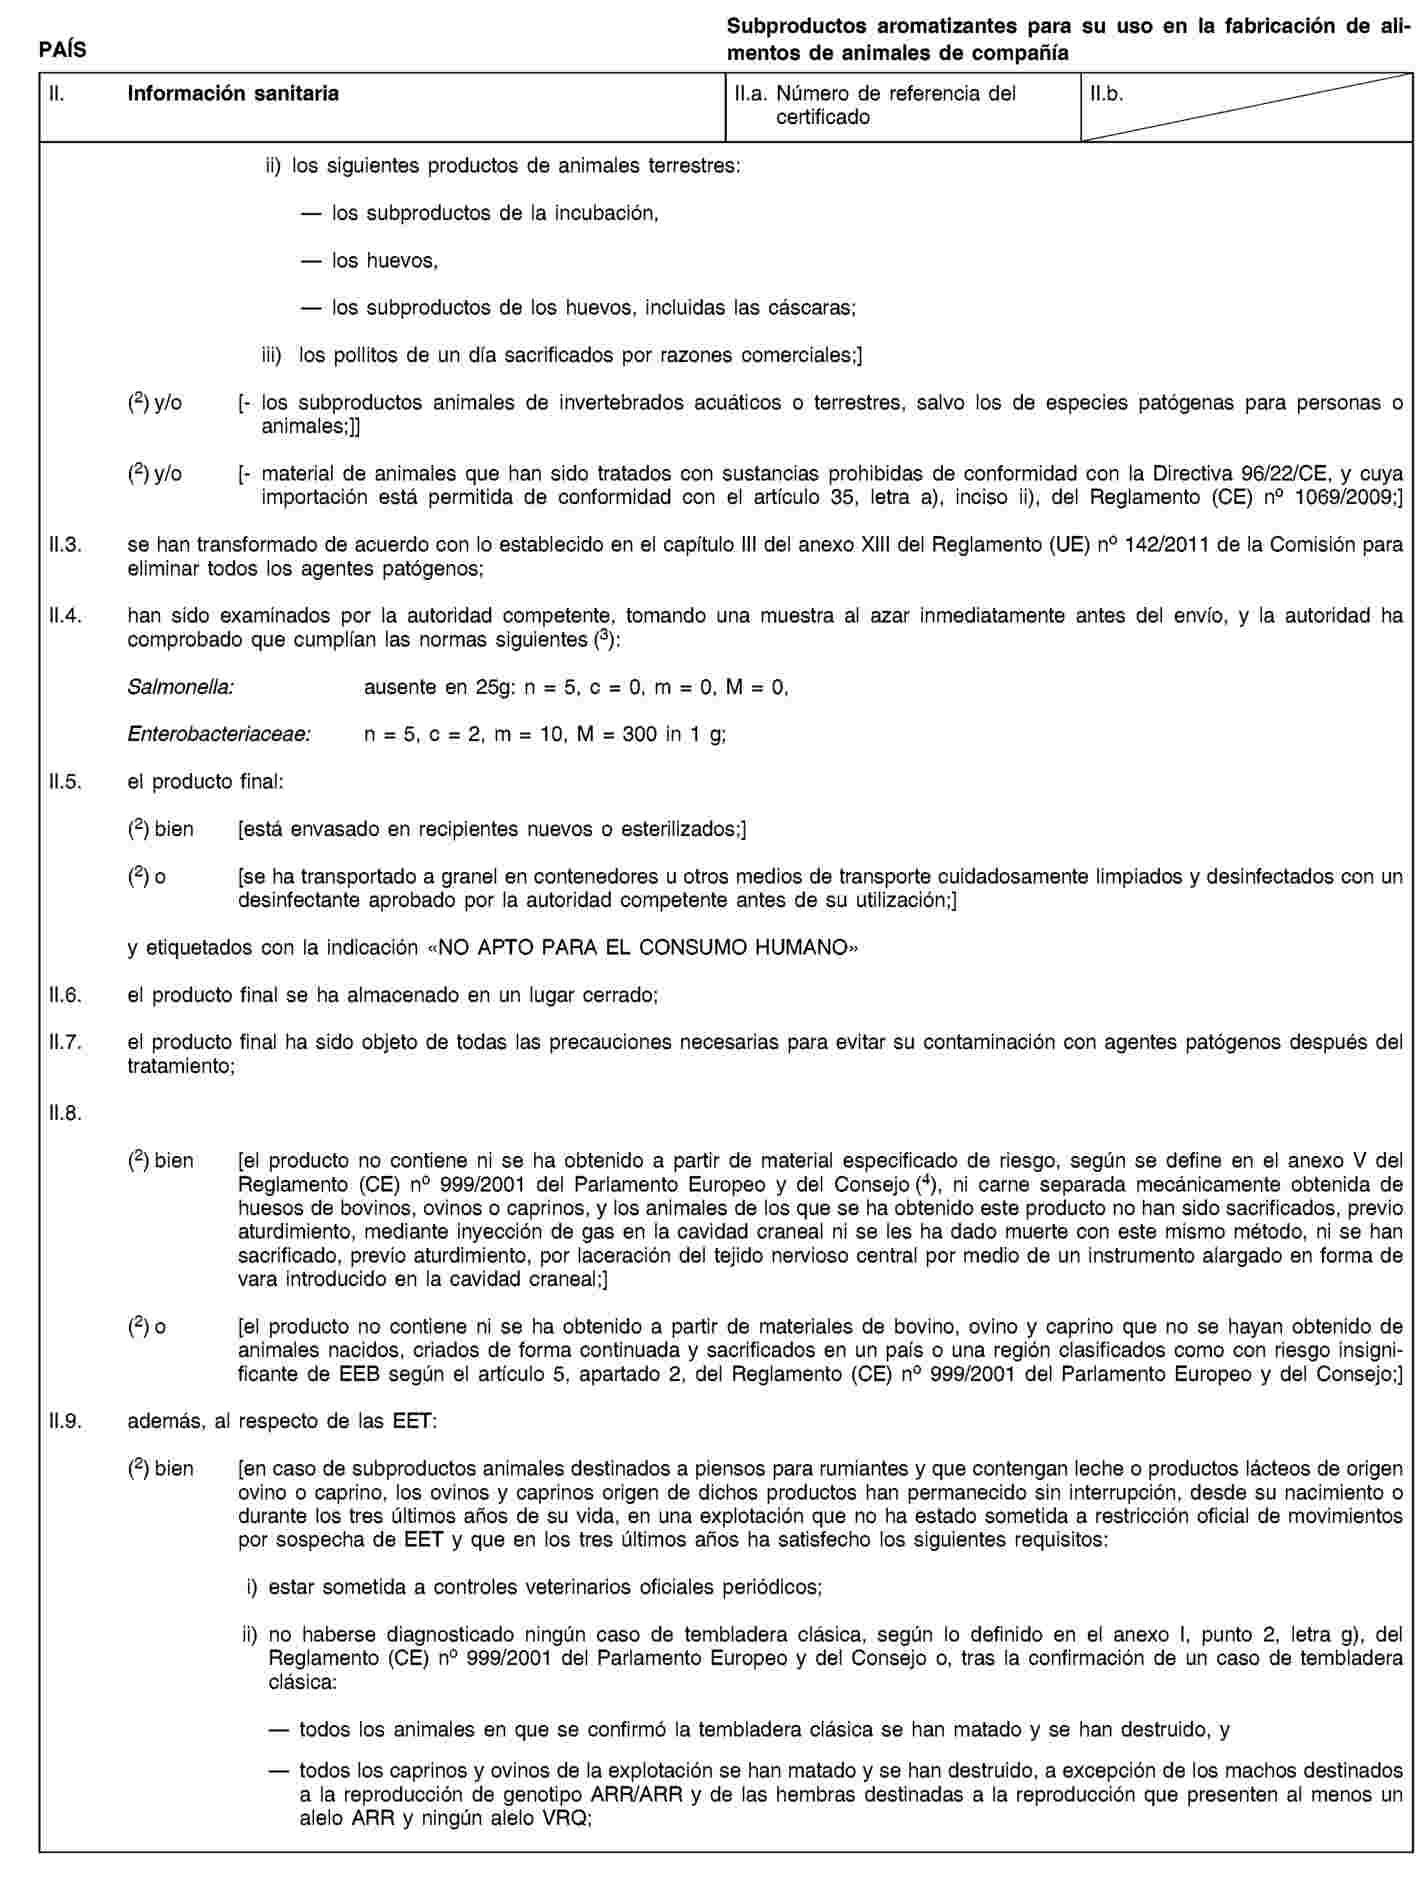 Imagen: https://eur-lex.europa.eu/resource.html?uri=uriserv:OJ.L_.2011.054.01.0001.01.SPA.xhtml.L_2011054ES.01015201.tif.jpg